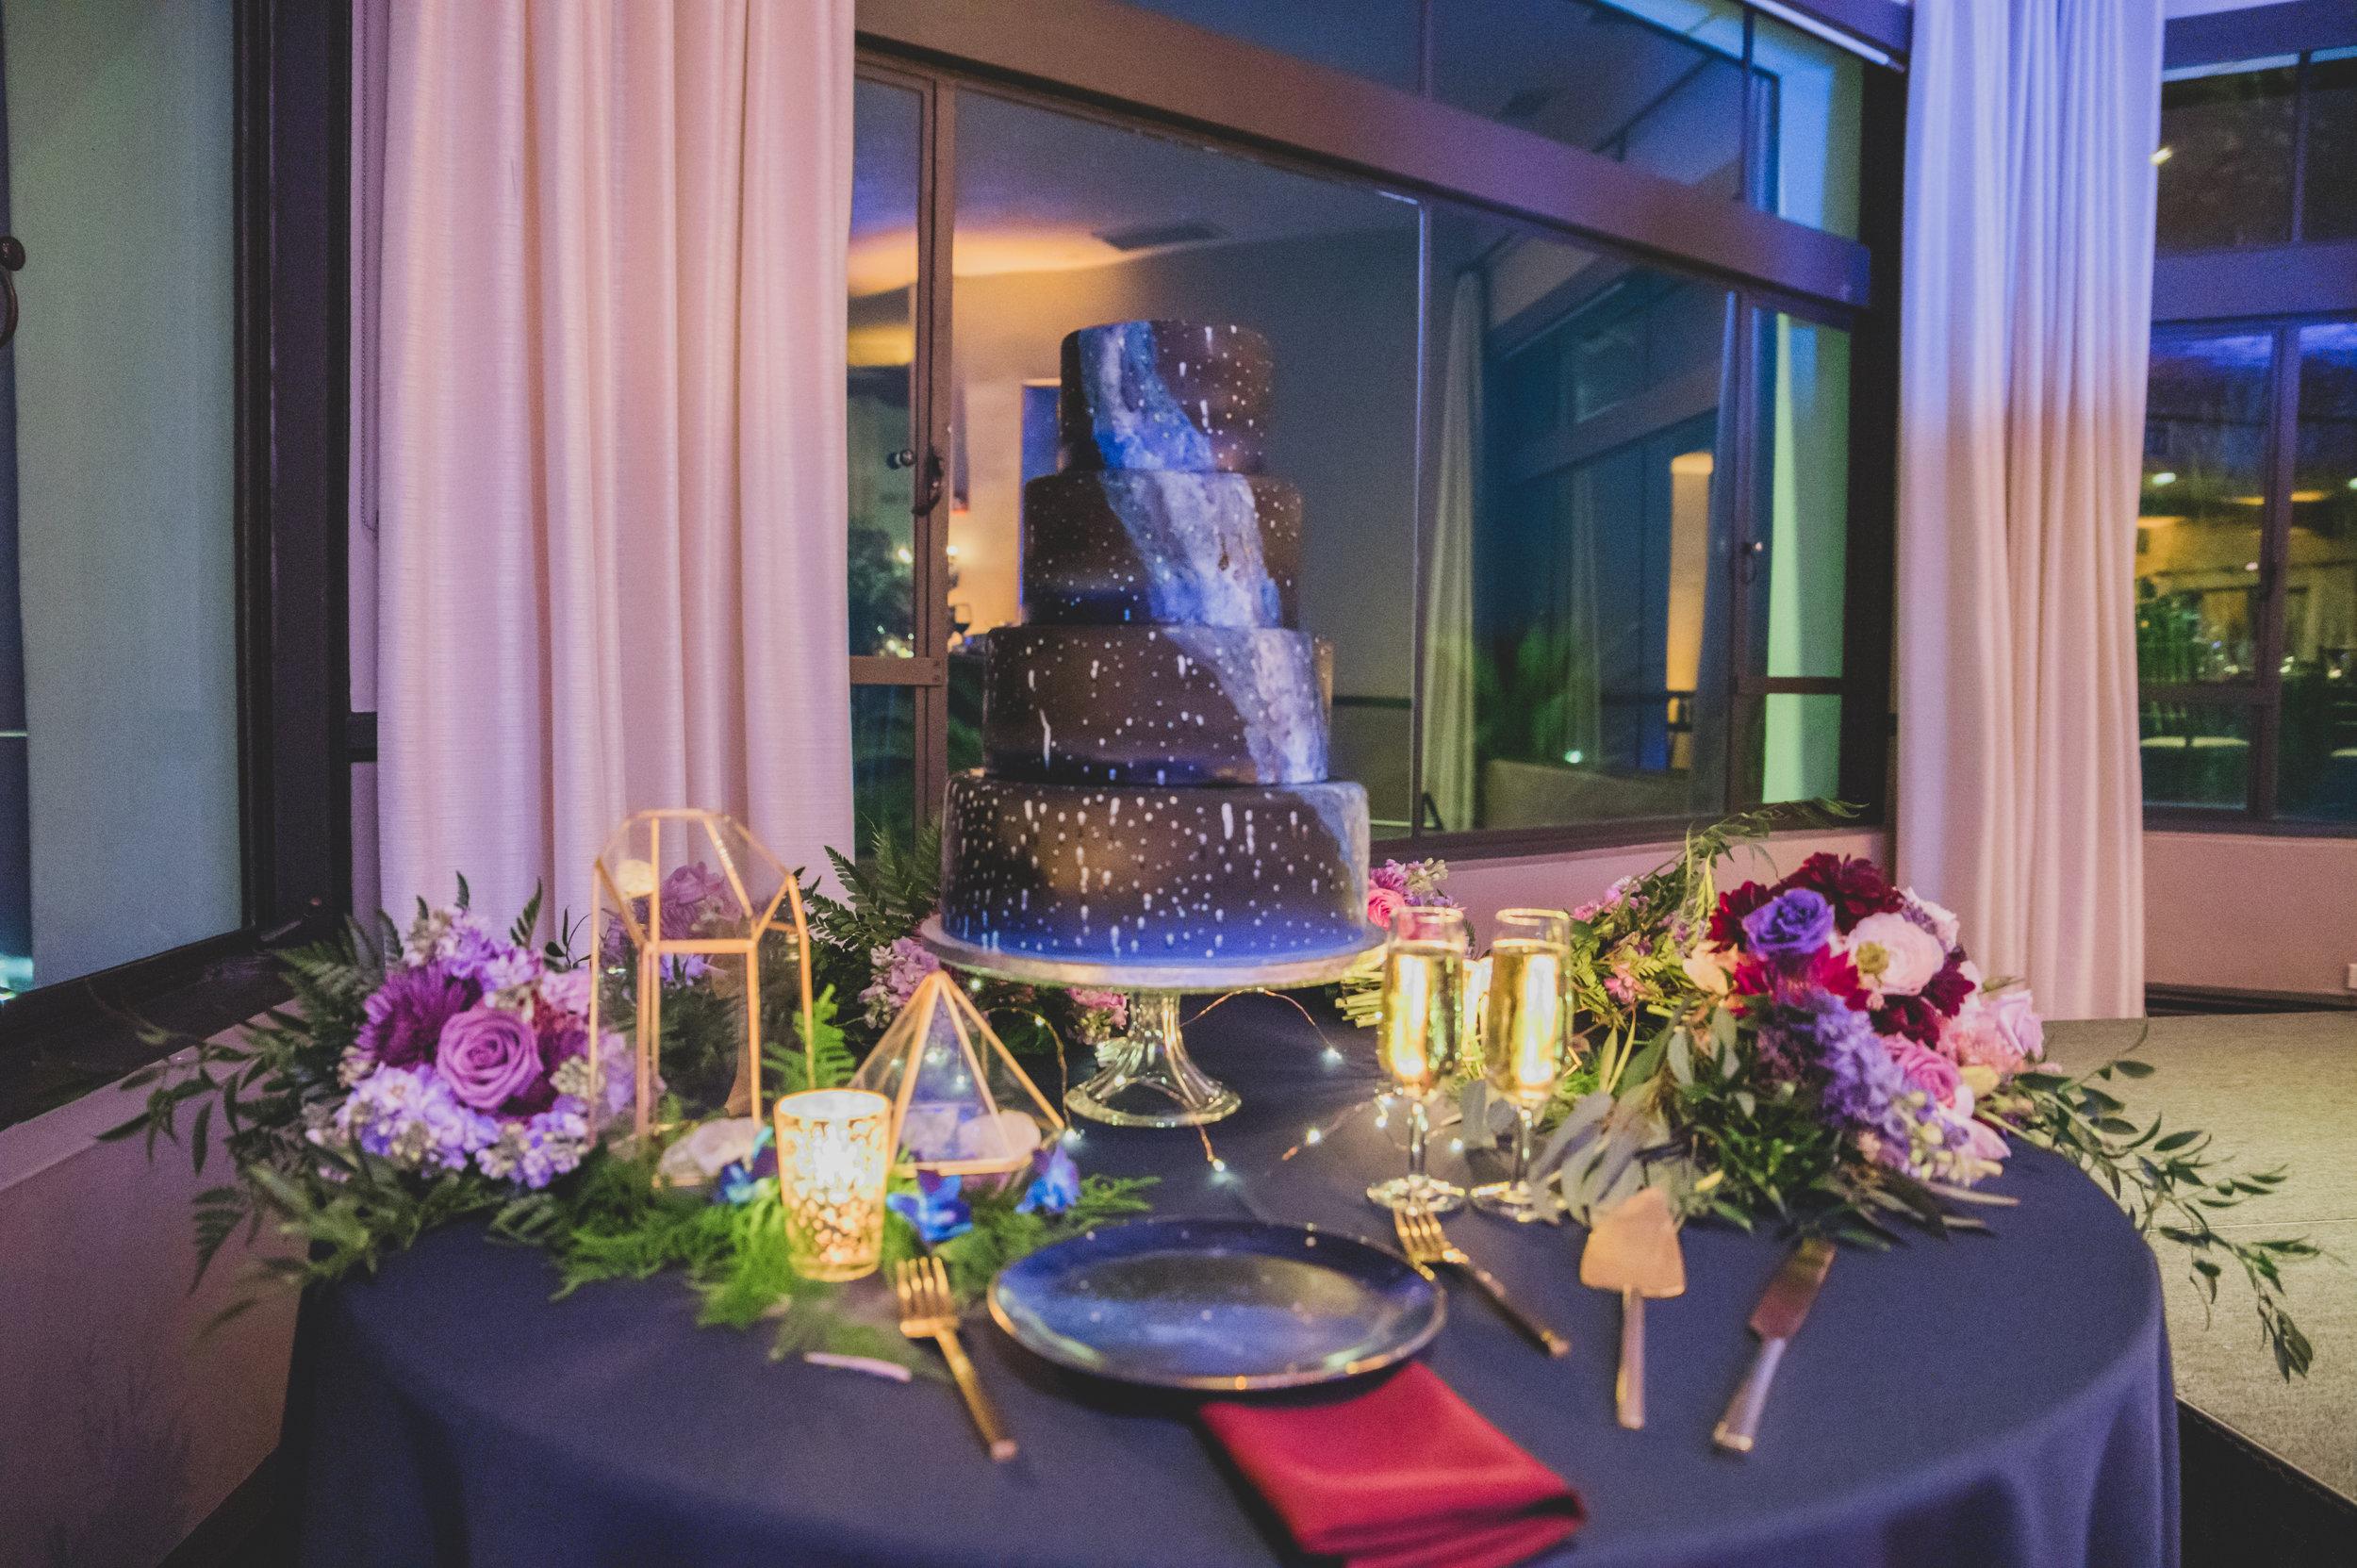 Modern Wedding Theme - A chic, intergalactic themed wedding cake.